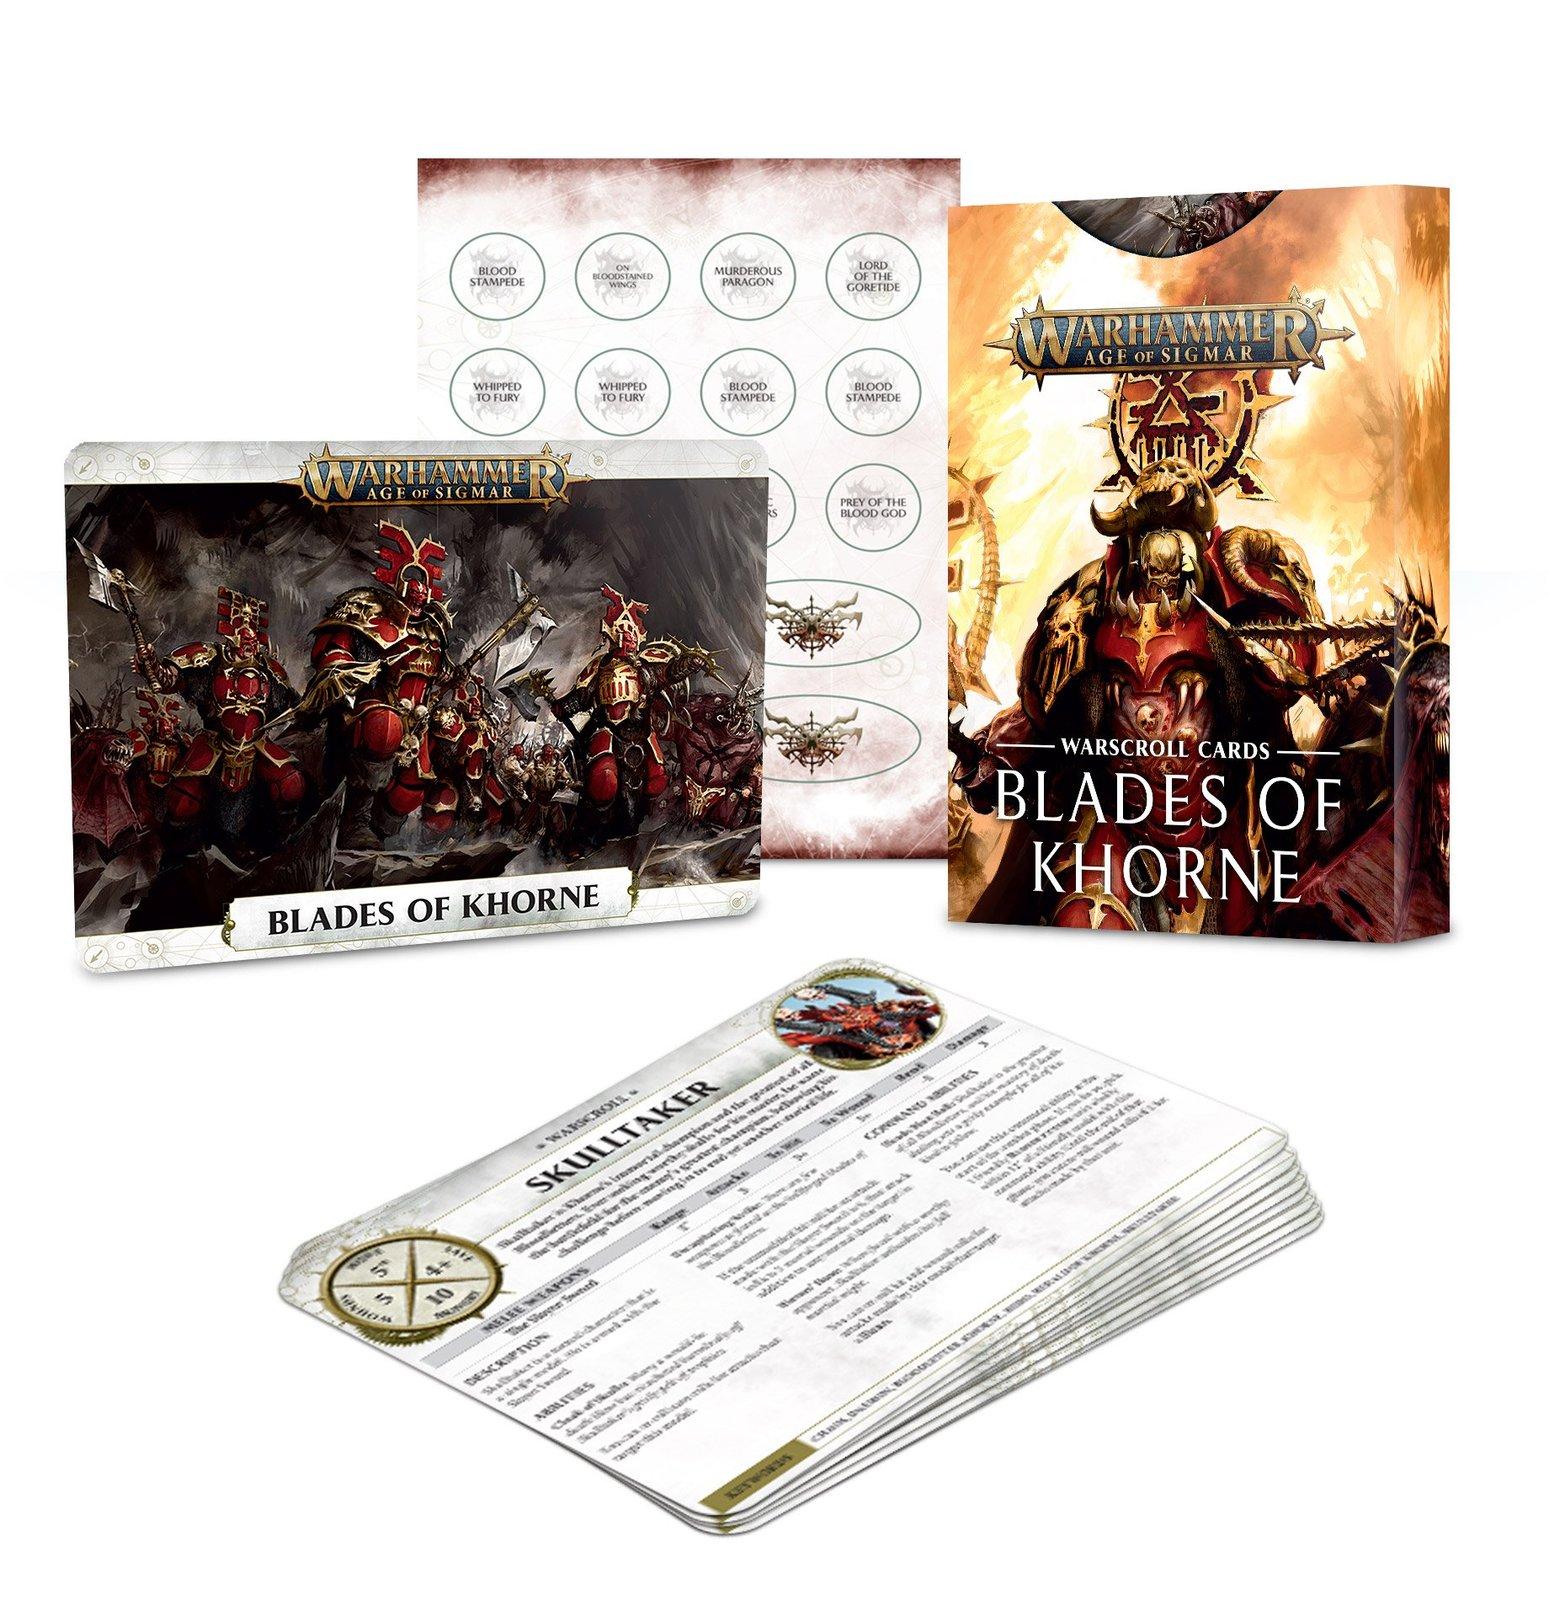 Warhammer Age of Sigmar: Blades Of Khorne - Warscroll Cards image